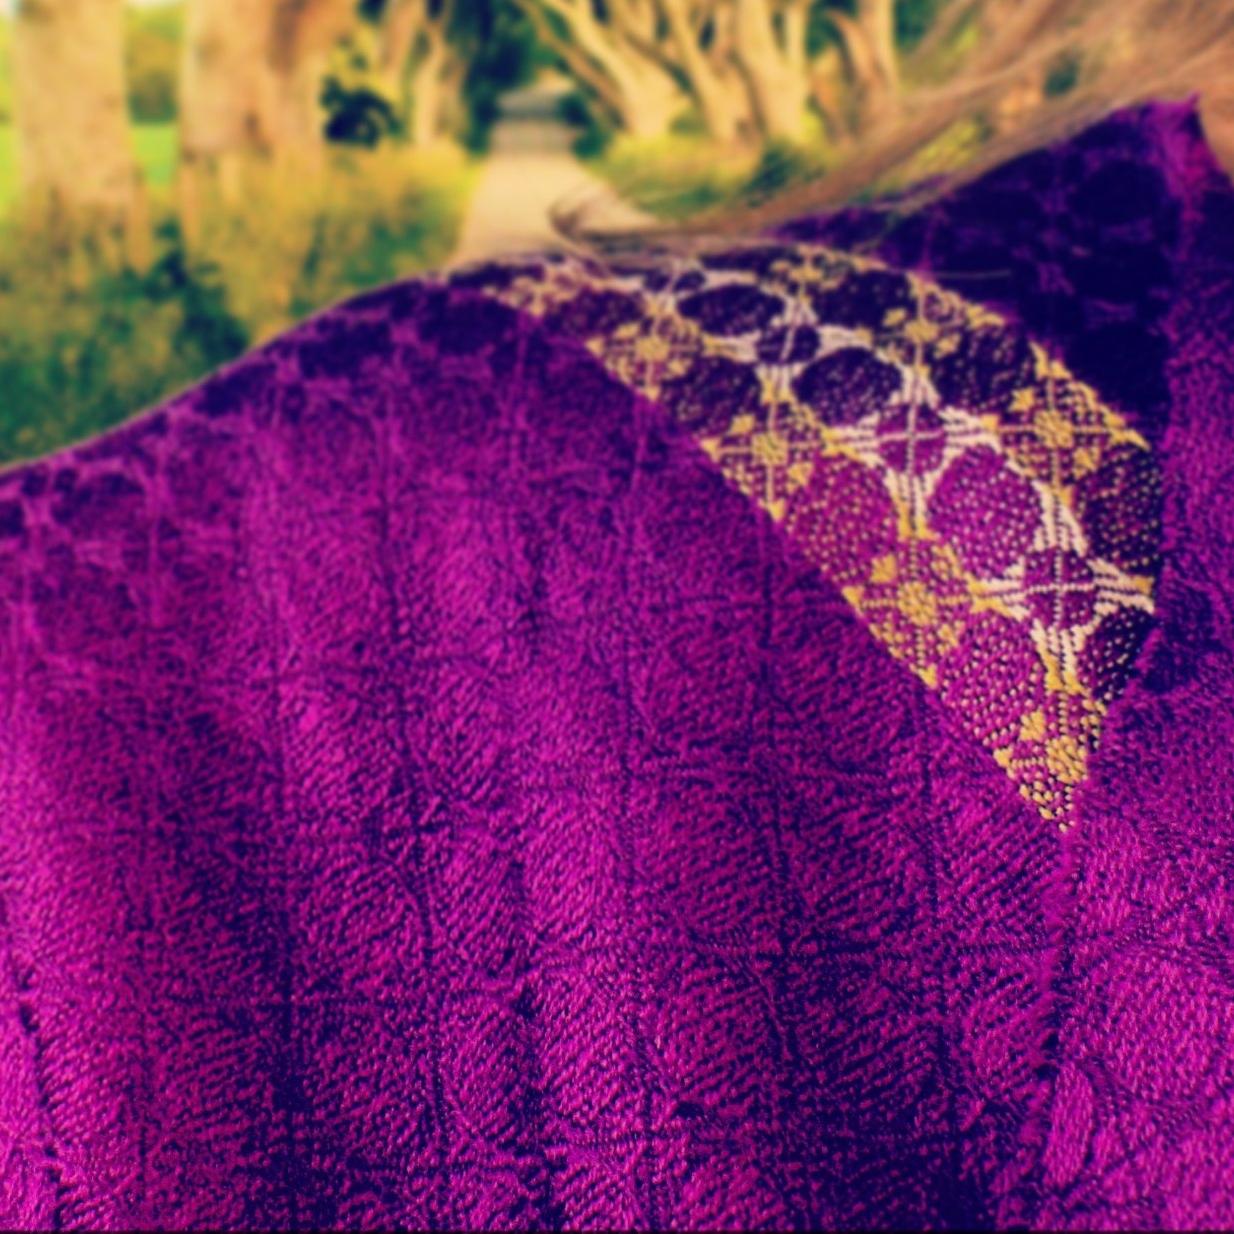 petal-stem-magenta-pink-silk-scarf-brendan-joseph-dark-hedges.jpg